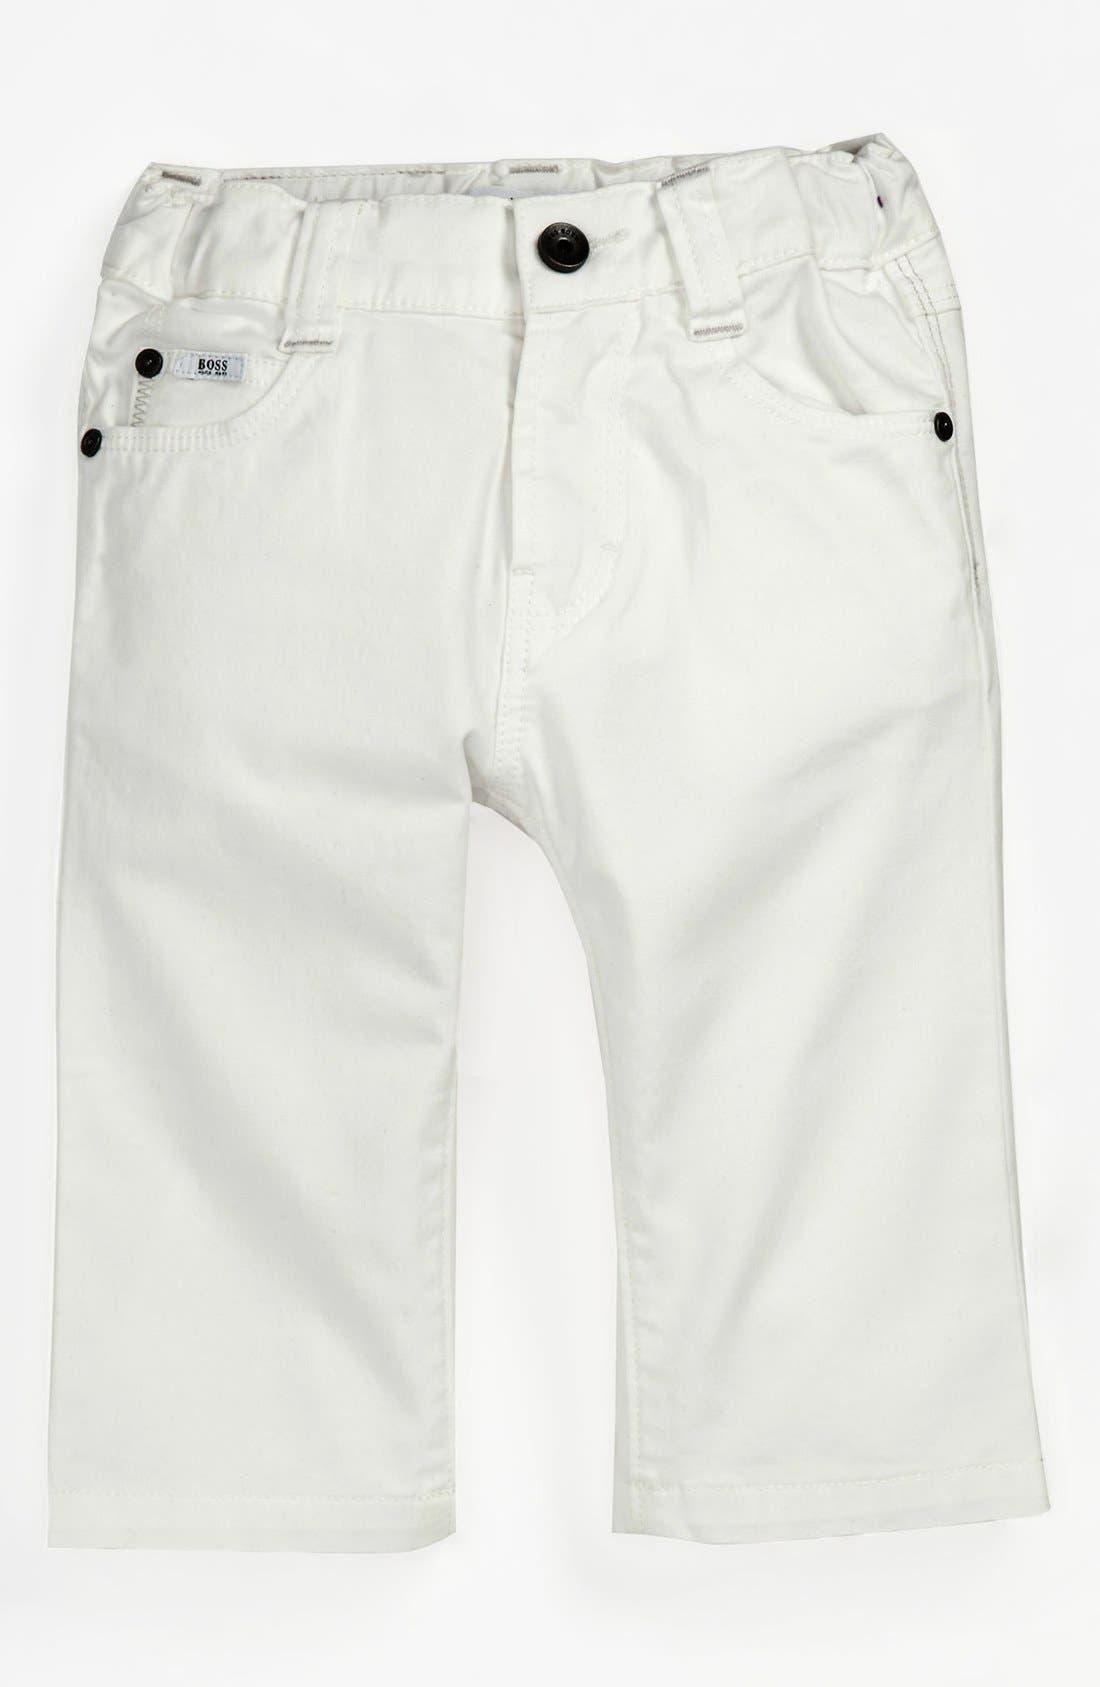 Alternate Image 1 Selected - BOSS Kidswear Twill Pants (Toddler)